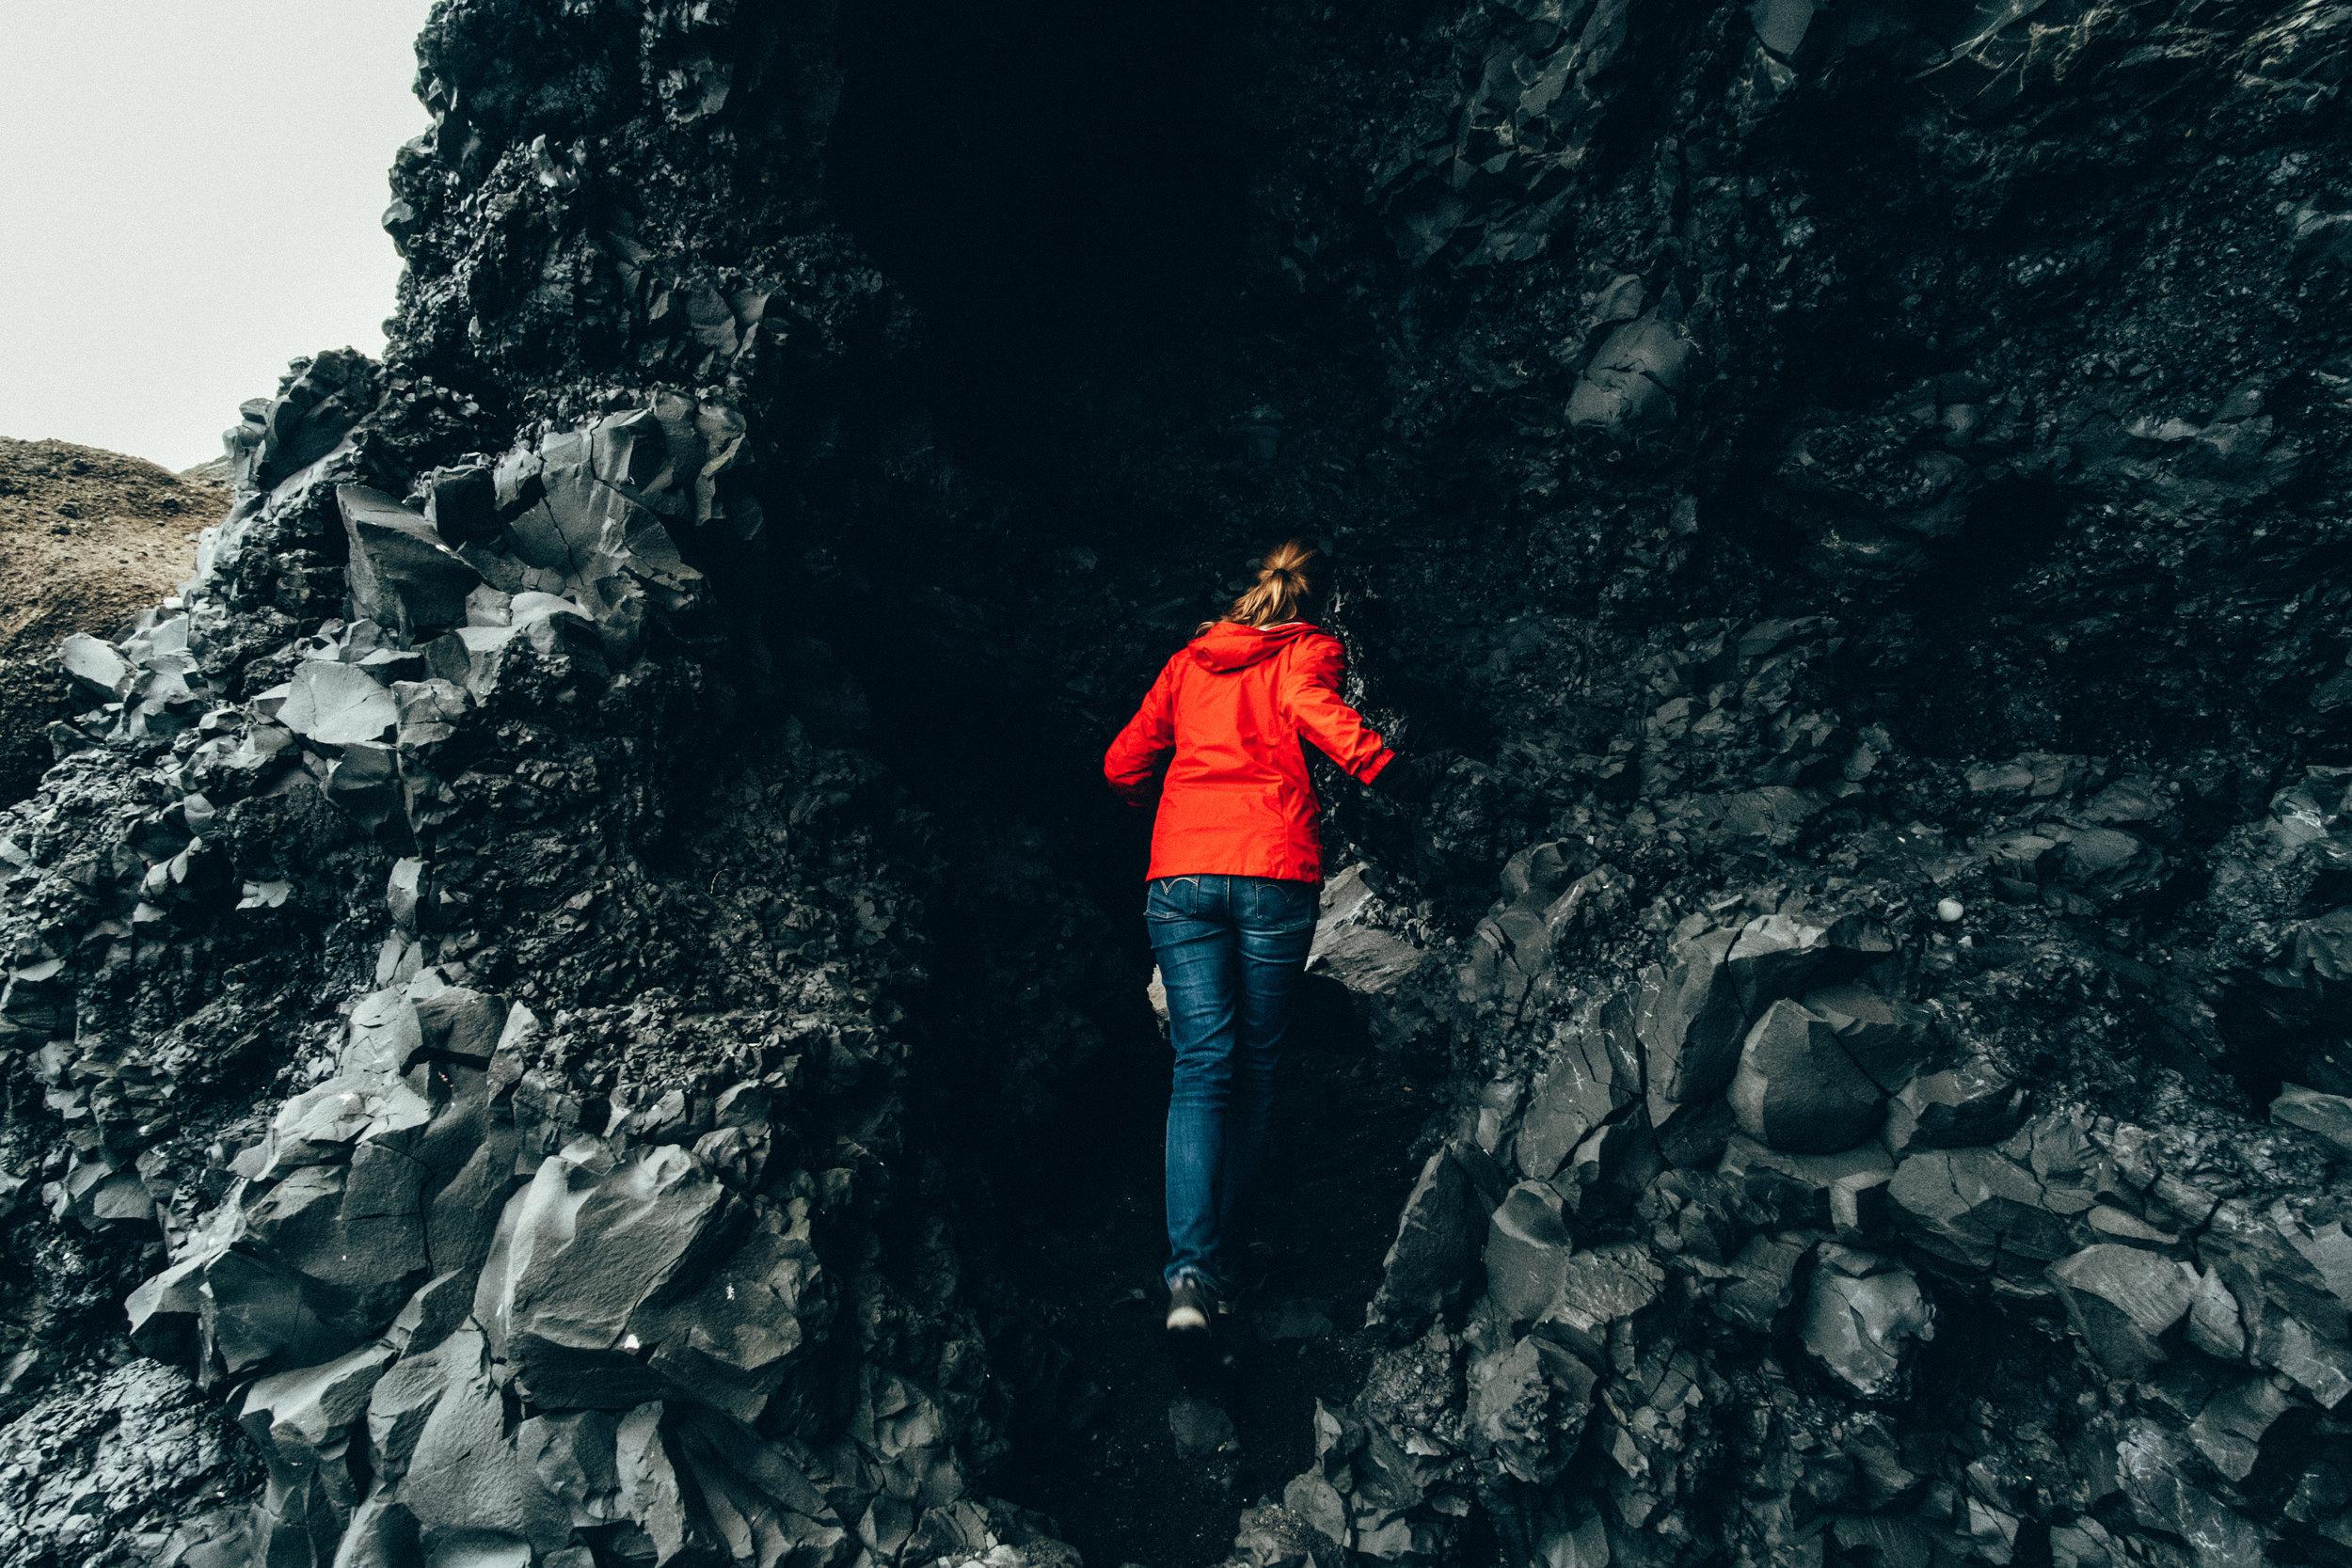 Reynisdrangar Cliffs Caves